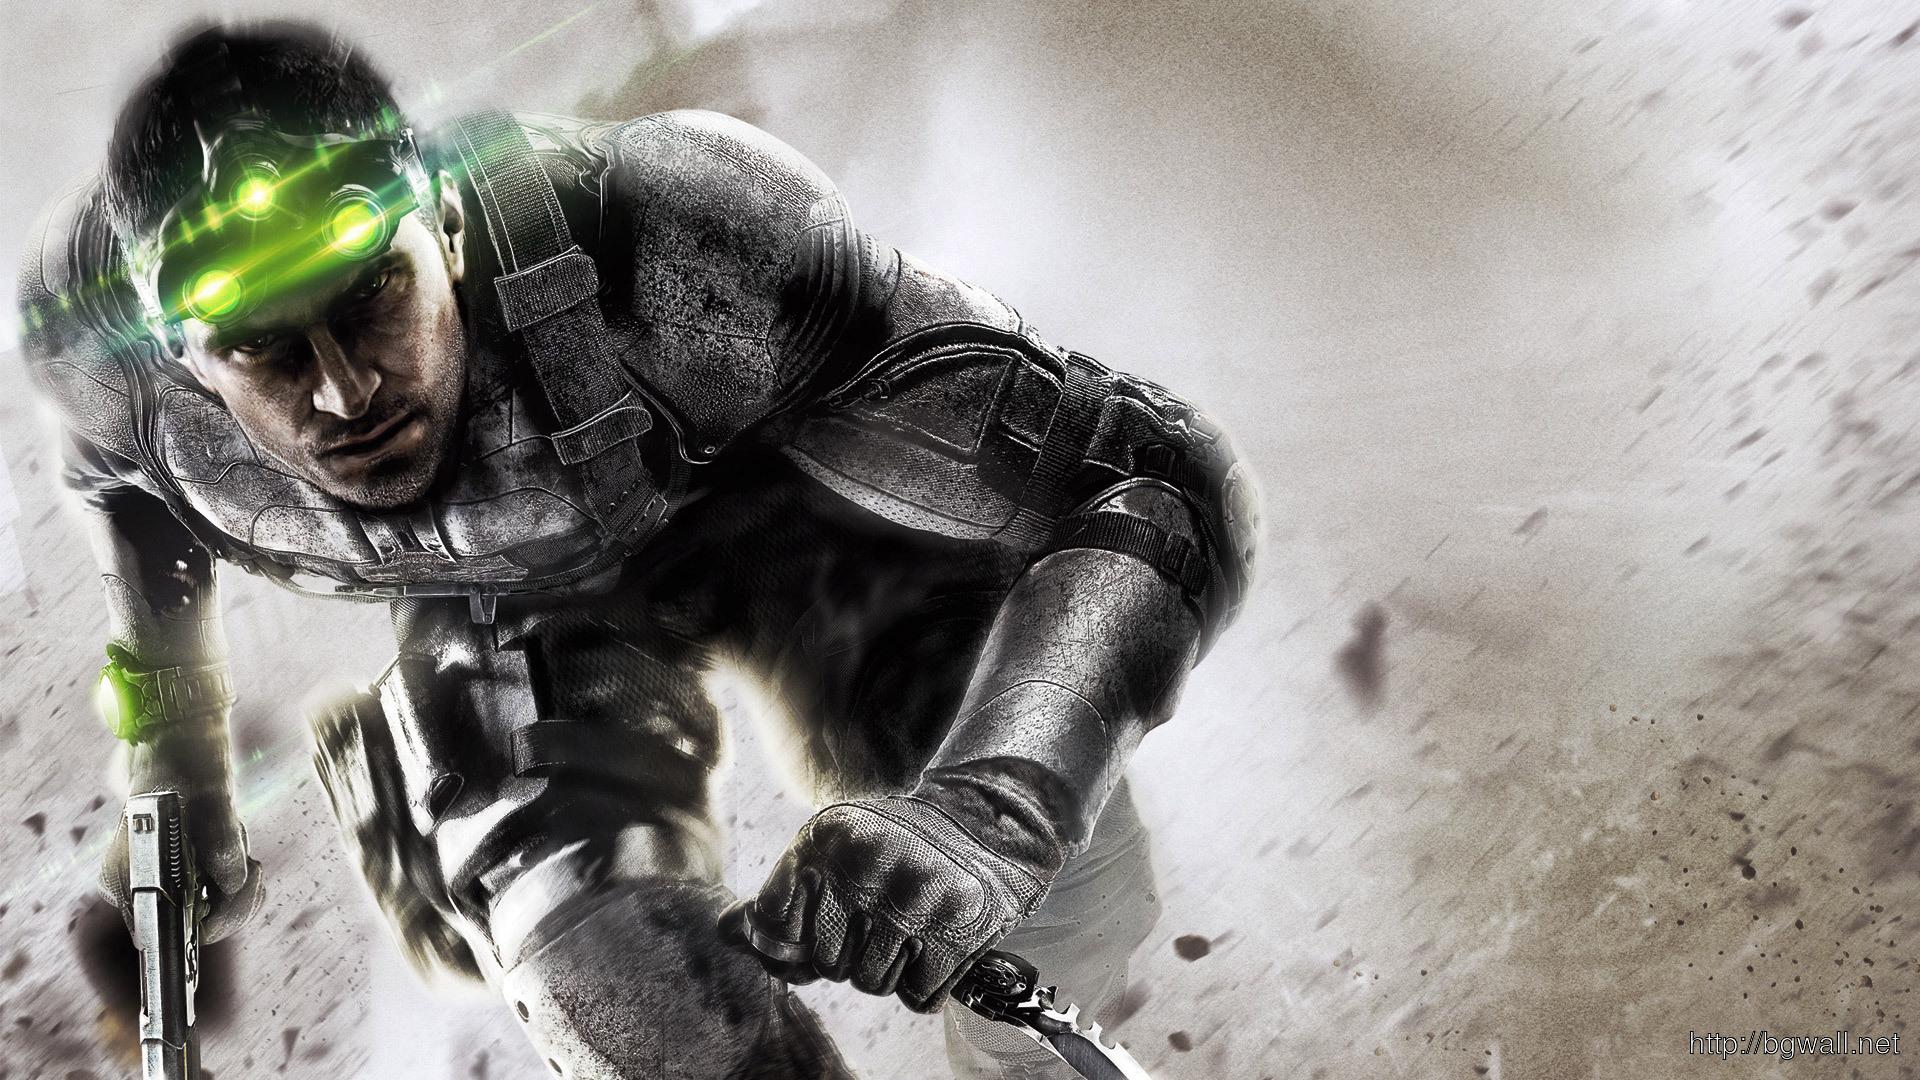 Wallpaper Hd Tom Clancys Splinter Cell Blacklist Game Full Size